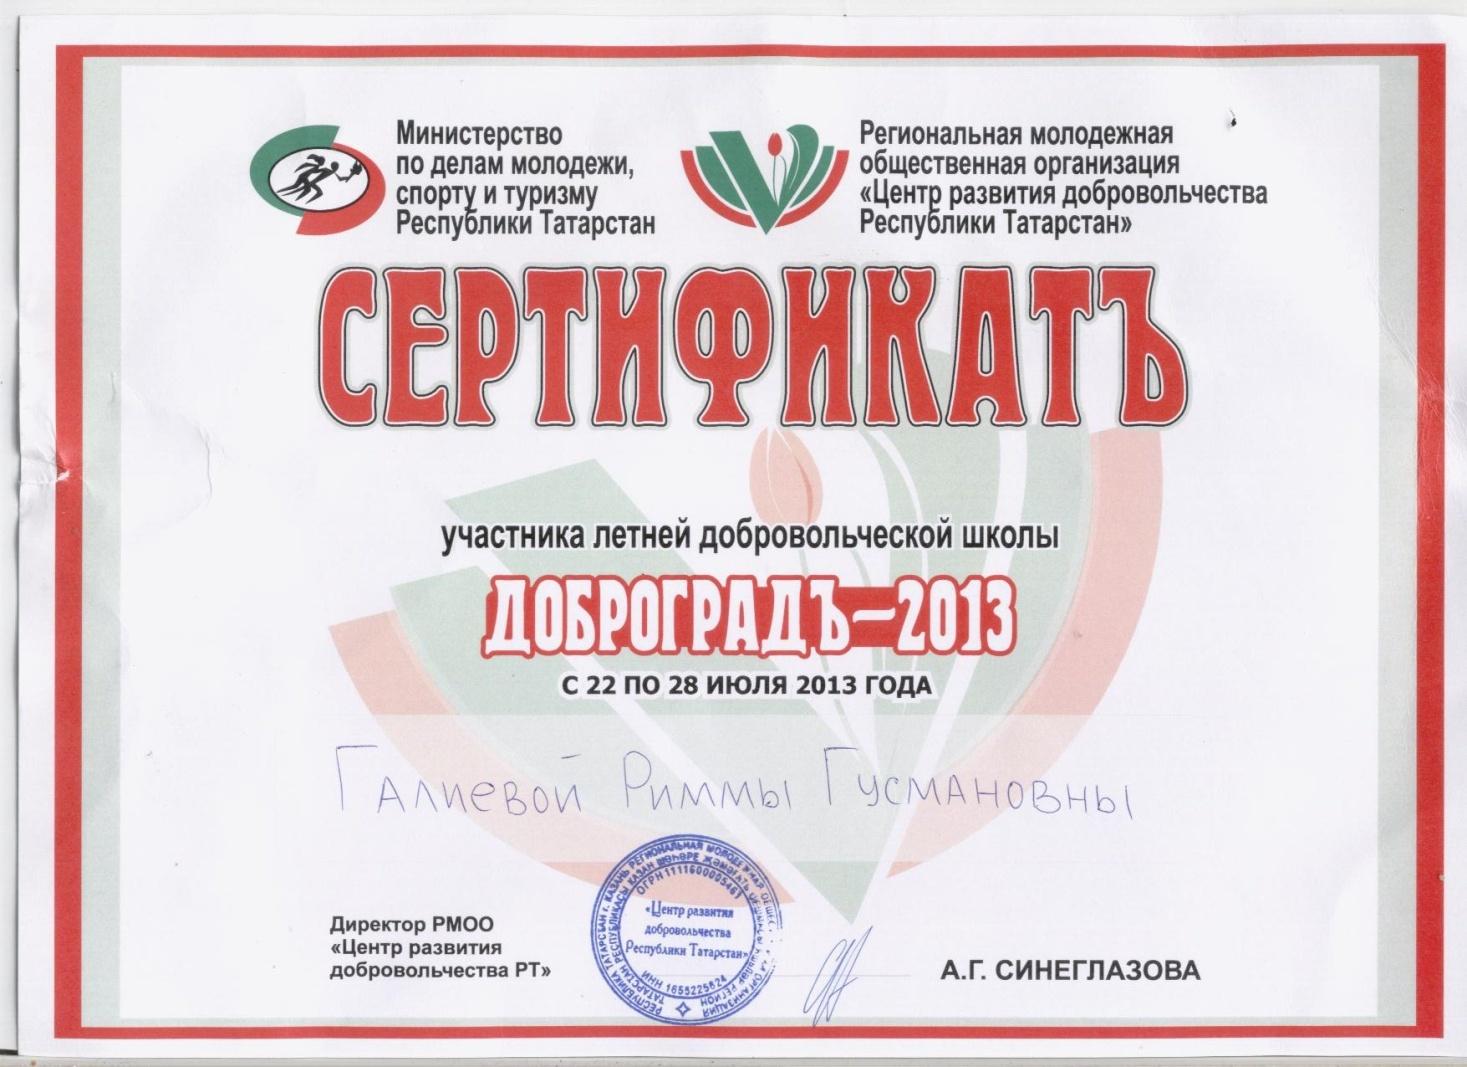 F:\Всероссйский конкурс Портфолио выпускника\РИММА\Римма 006.jpg